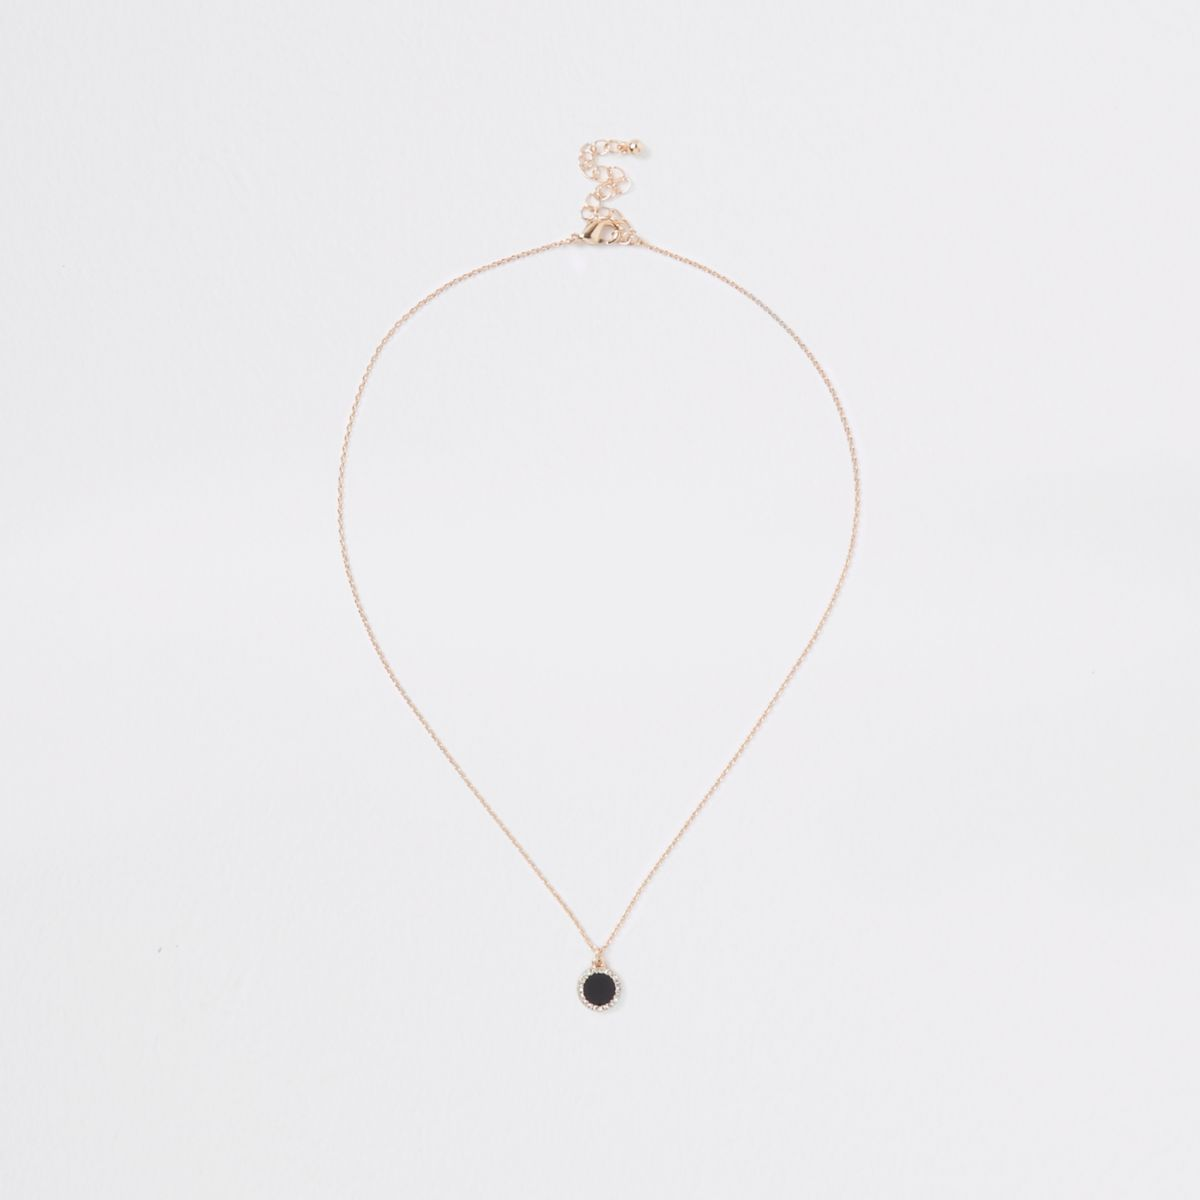 Black gold tone rhinestone pendant necklace